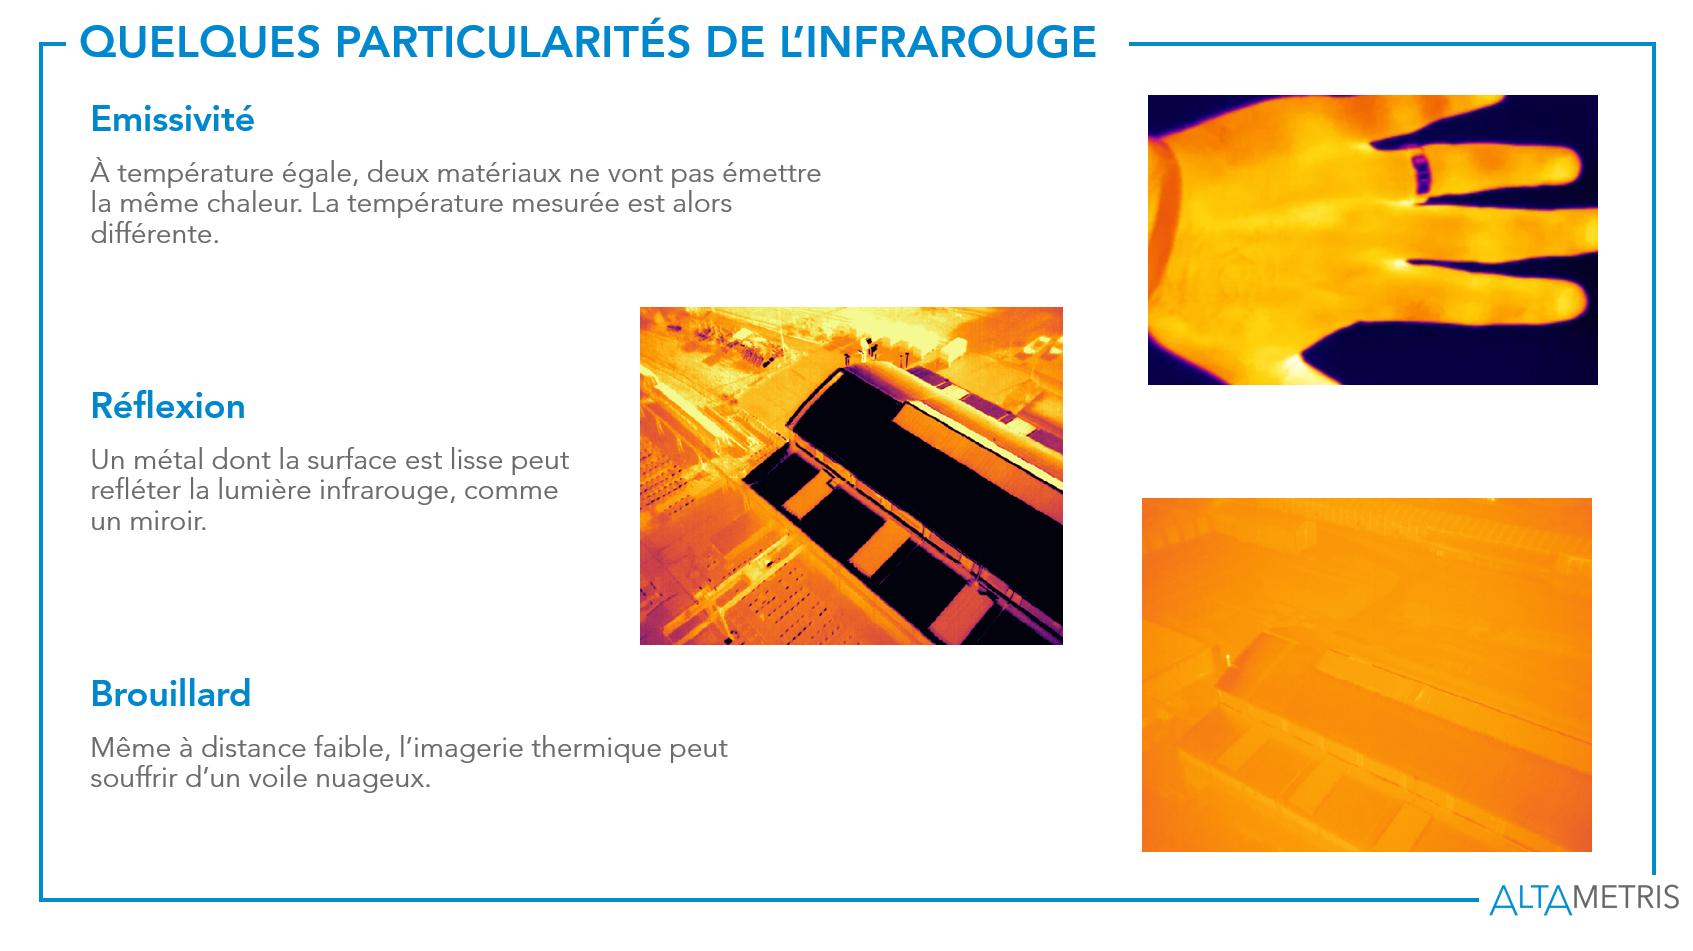 Particularités infrarouge